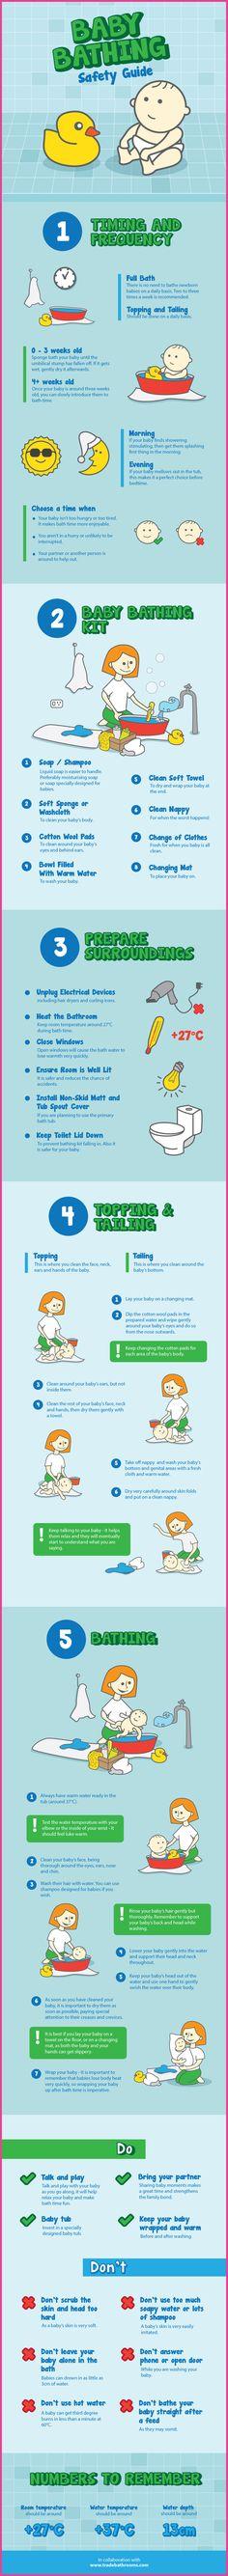 Bathing infographic